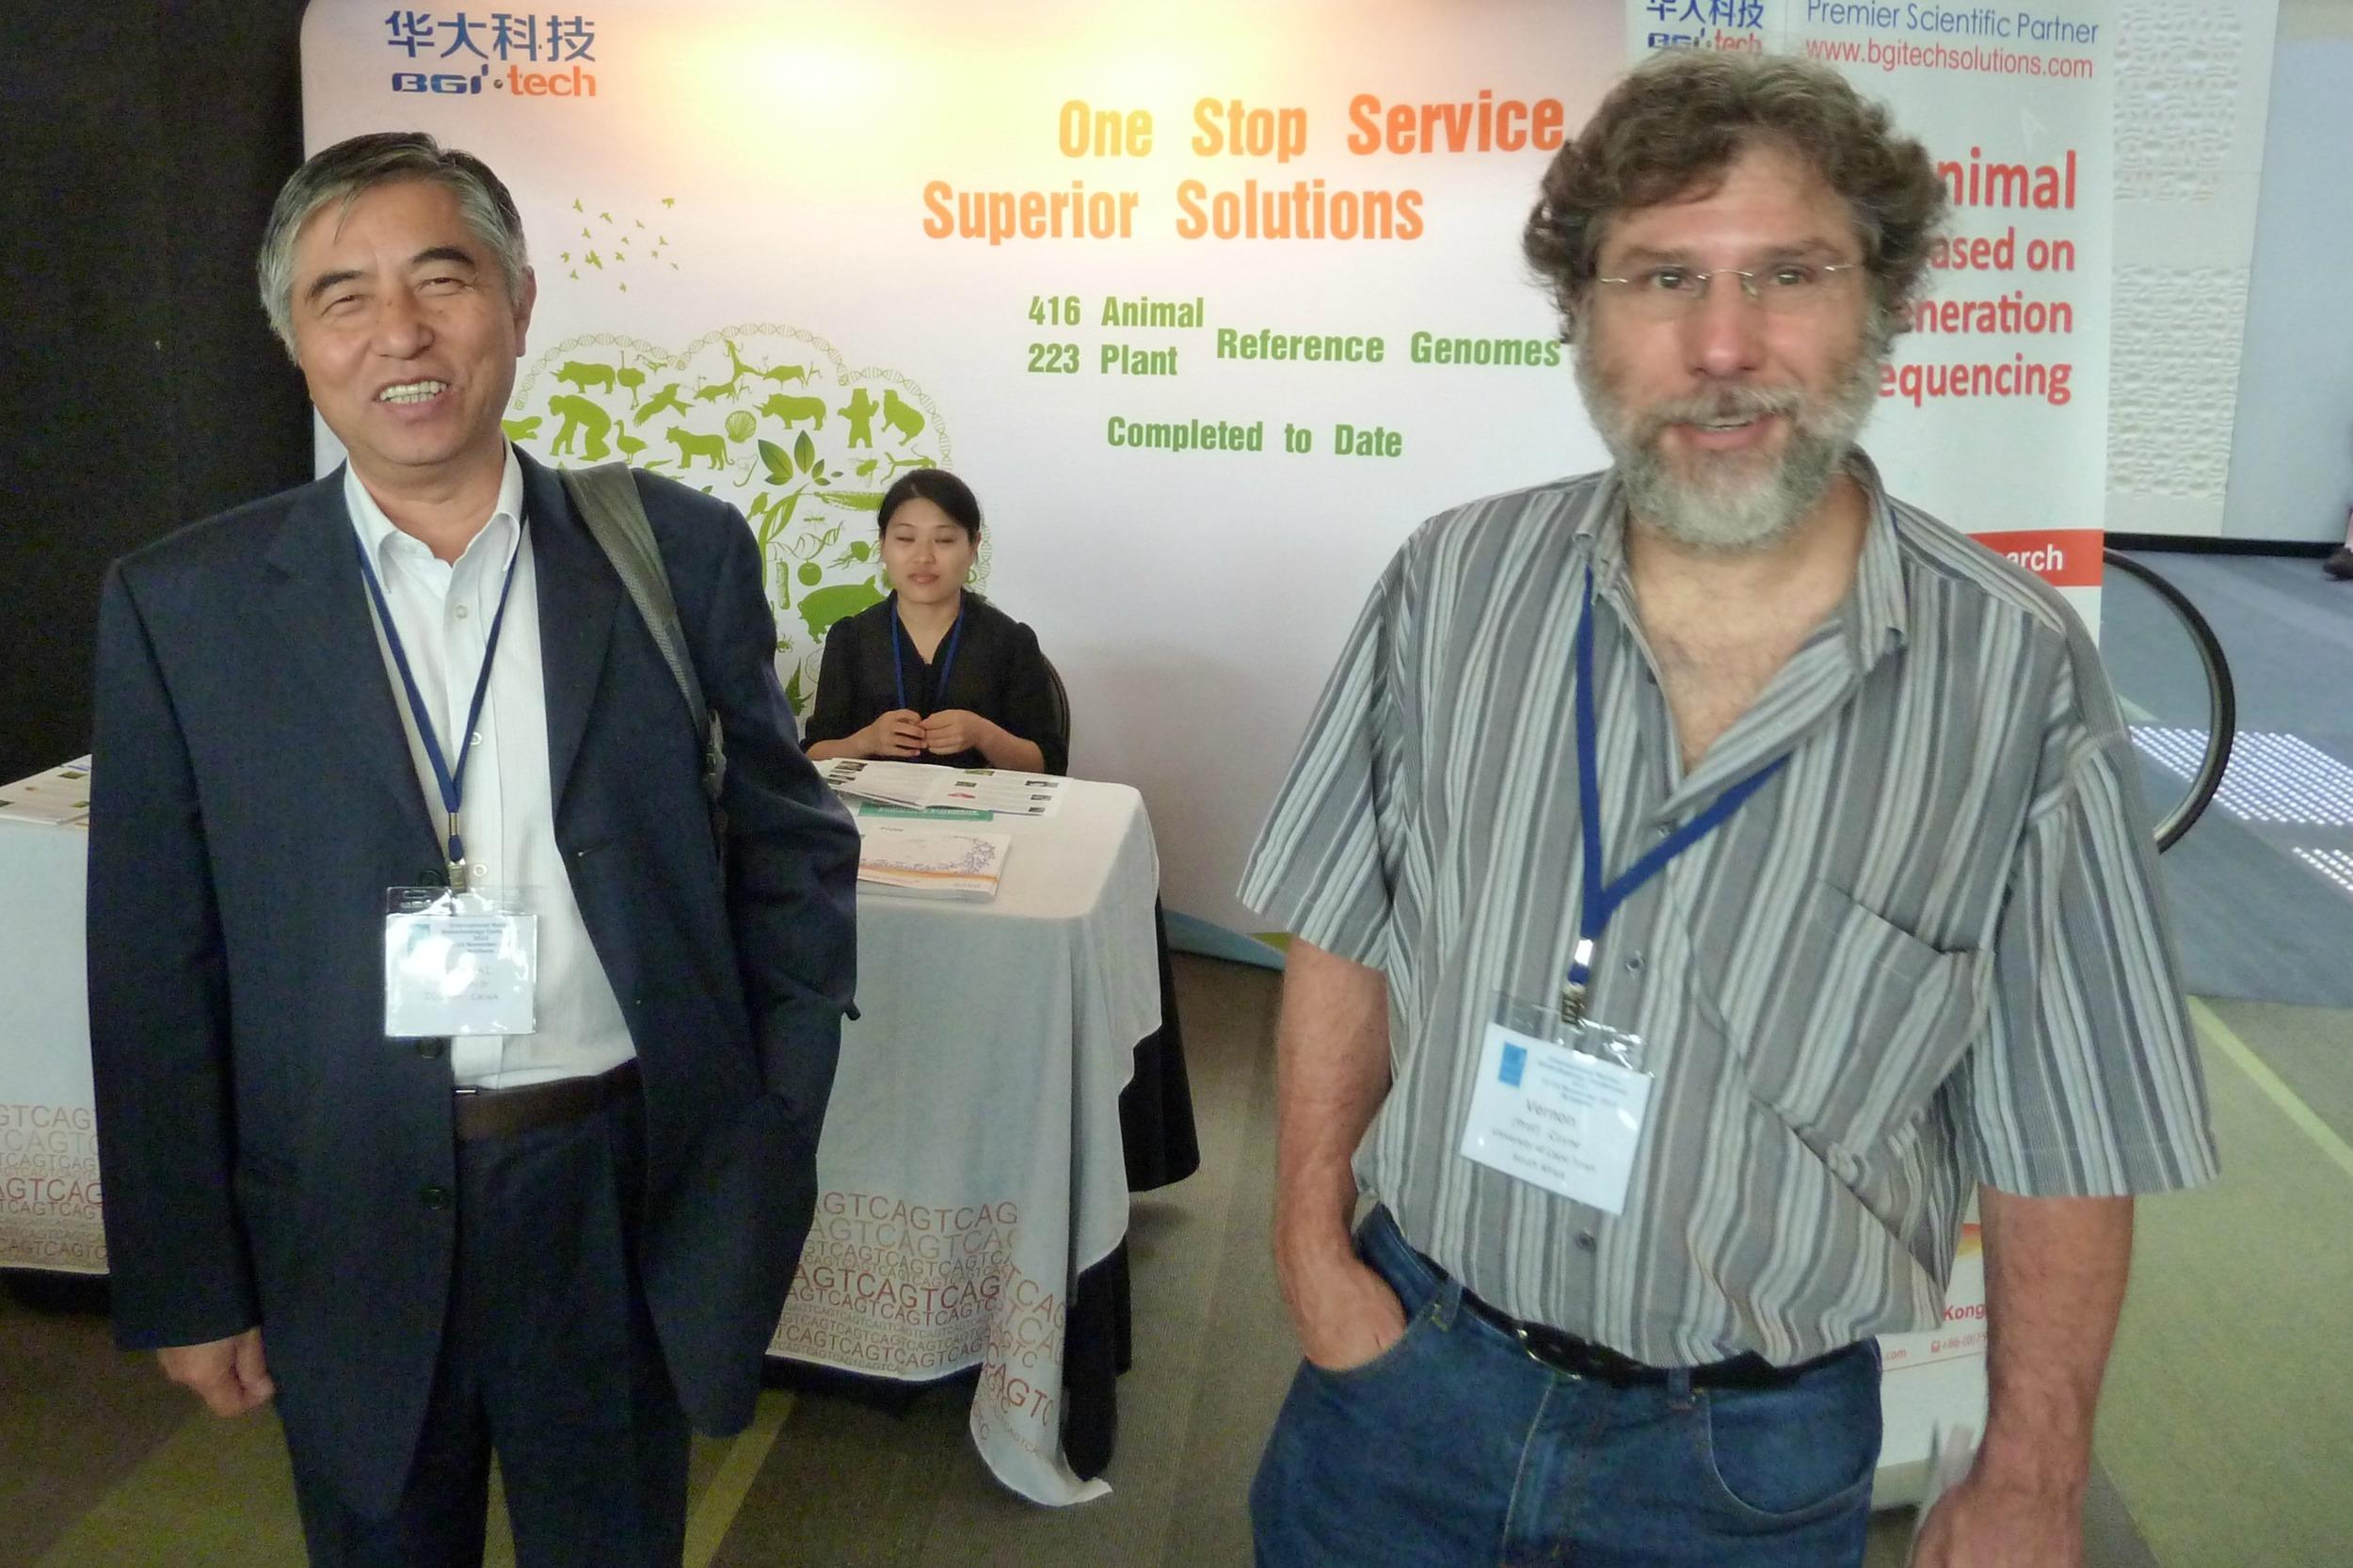 P1050224 Jianhai Xiang and Vernon Coyne.jpg